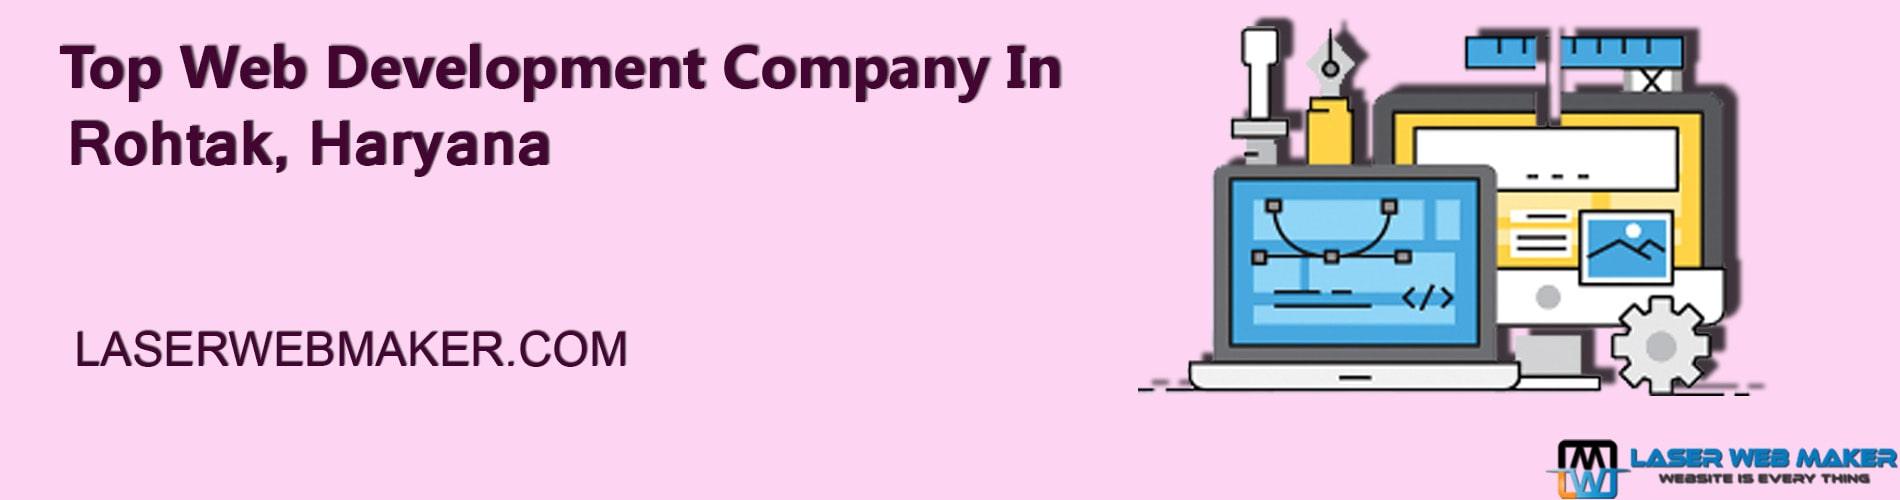 Top Web Development Company In Rohtak Haryana